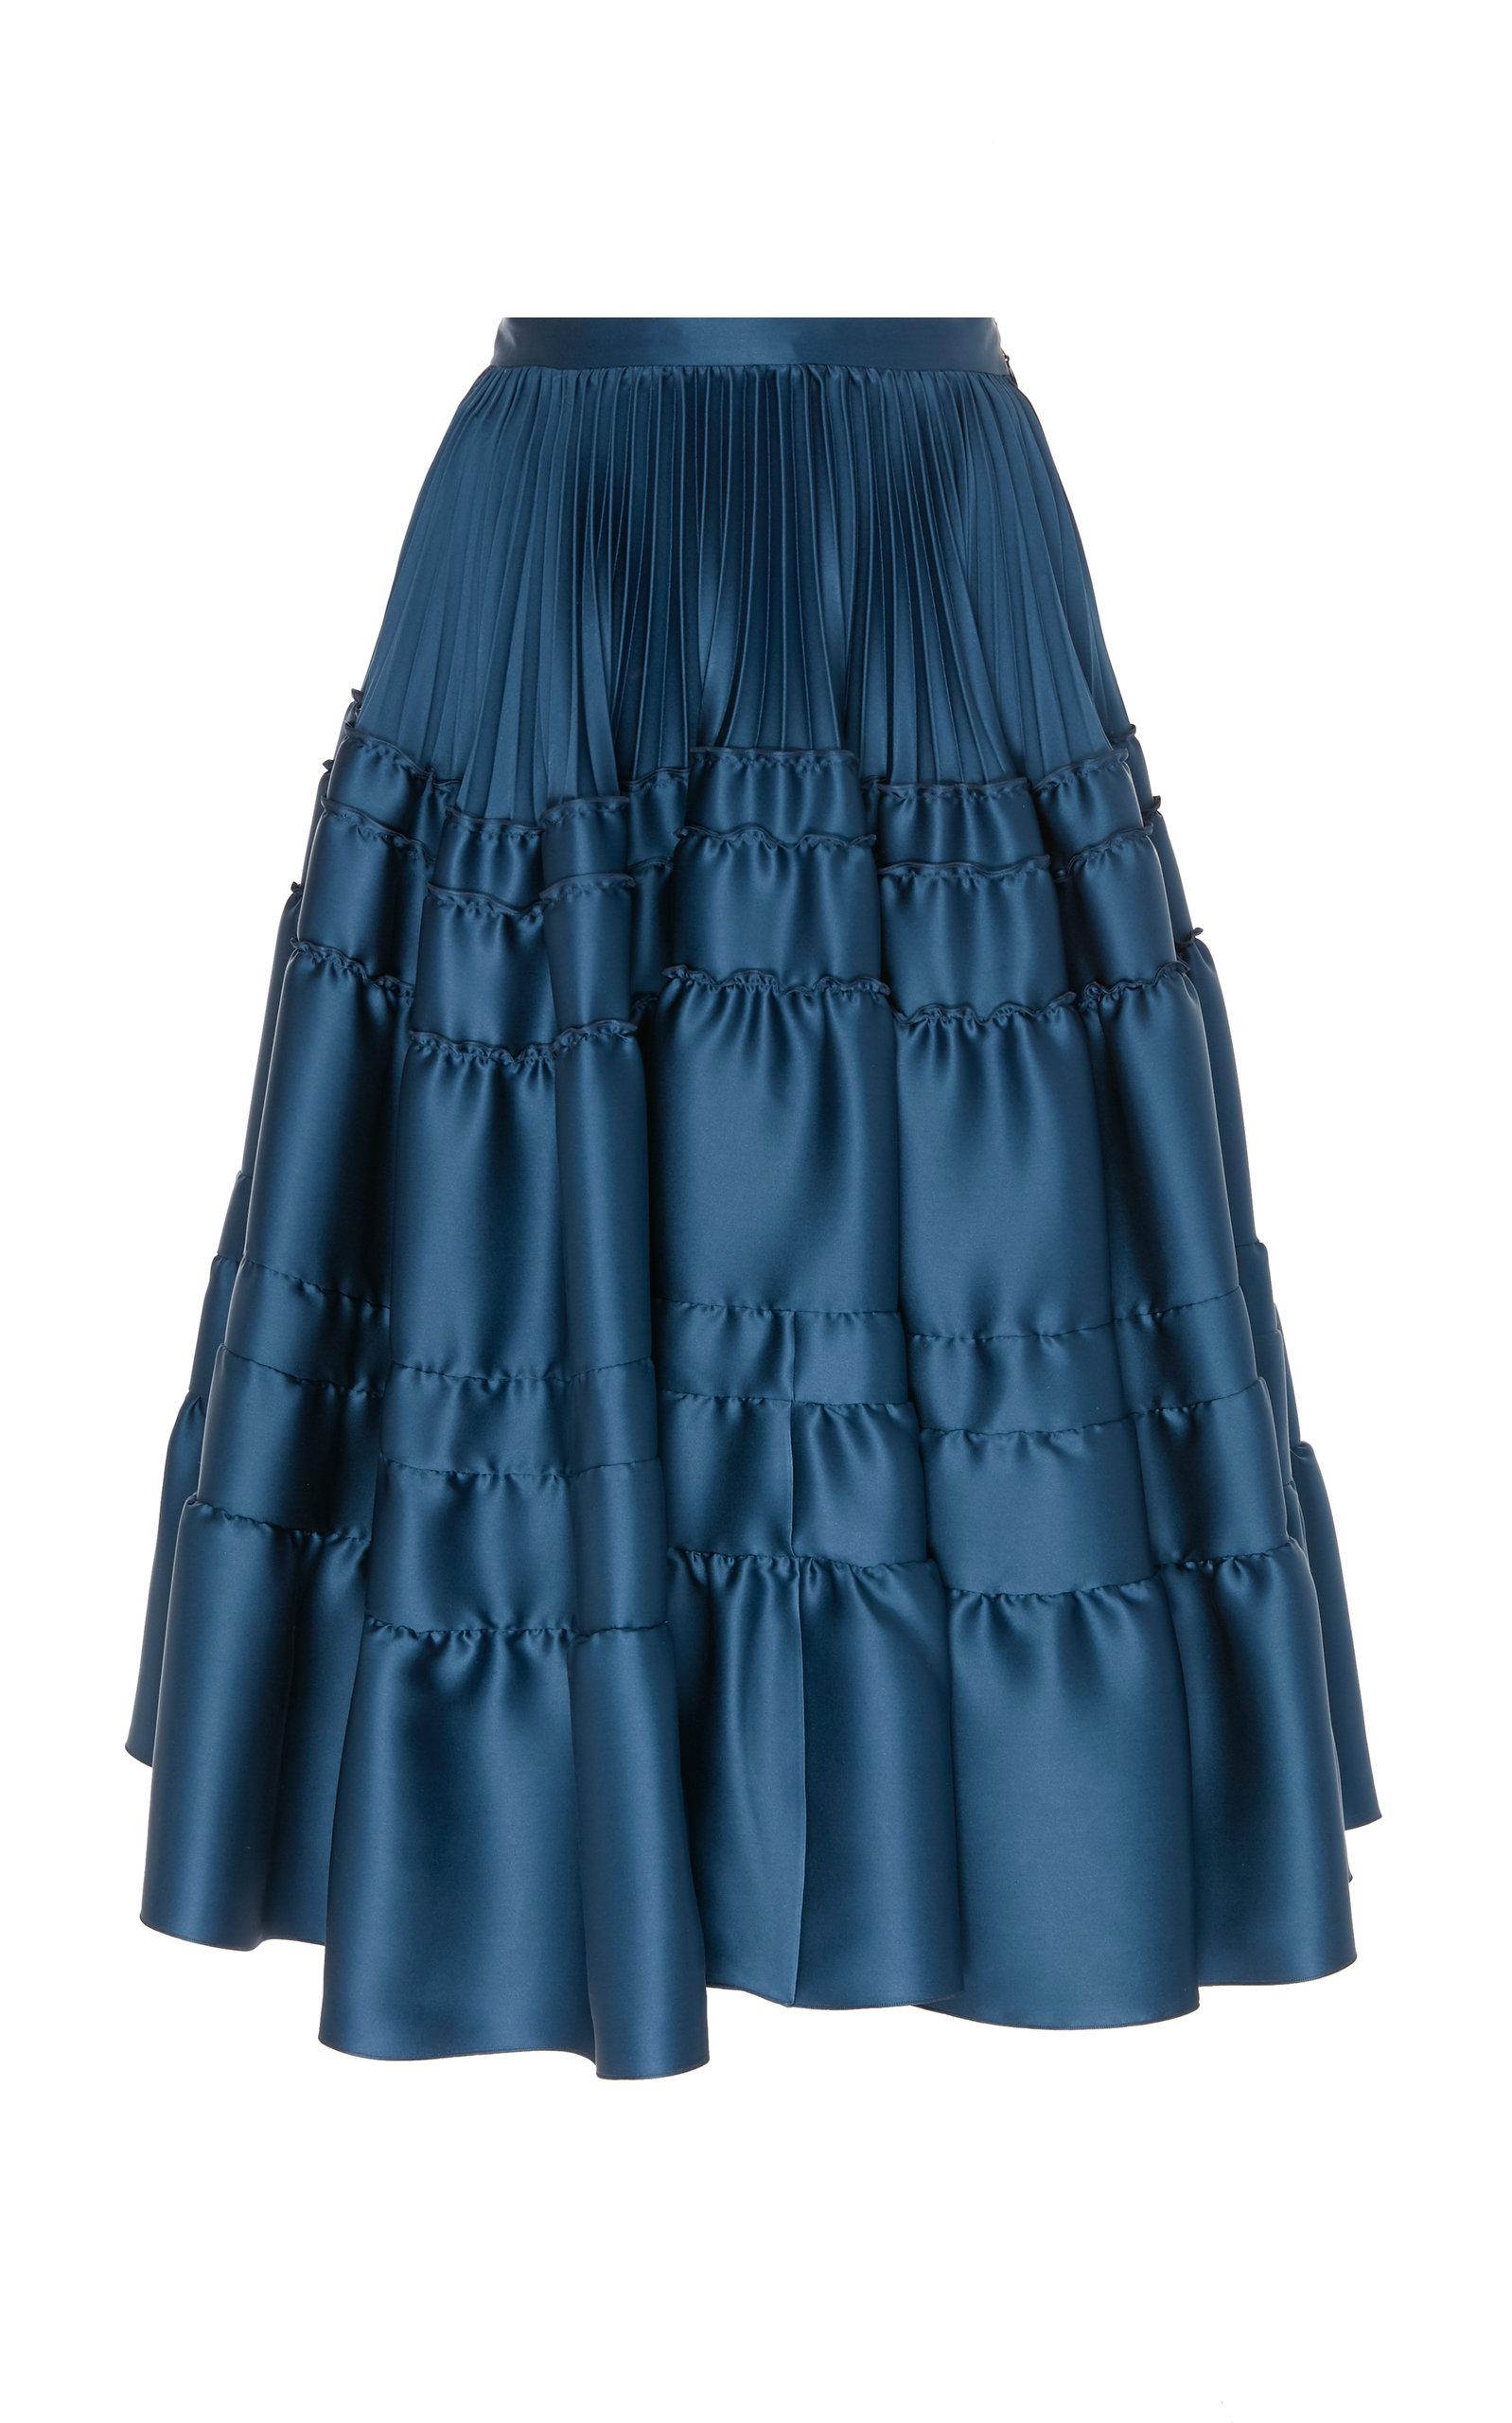 93a661f0c3 Gathered Silk Duchess Satin Skirt by Rochas | Moda Operandi